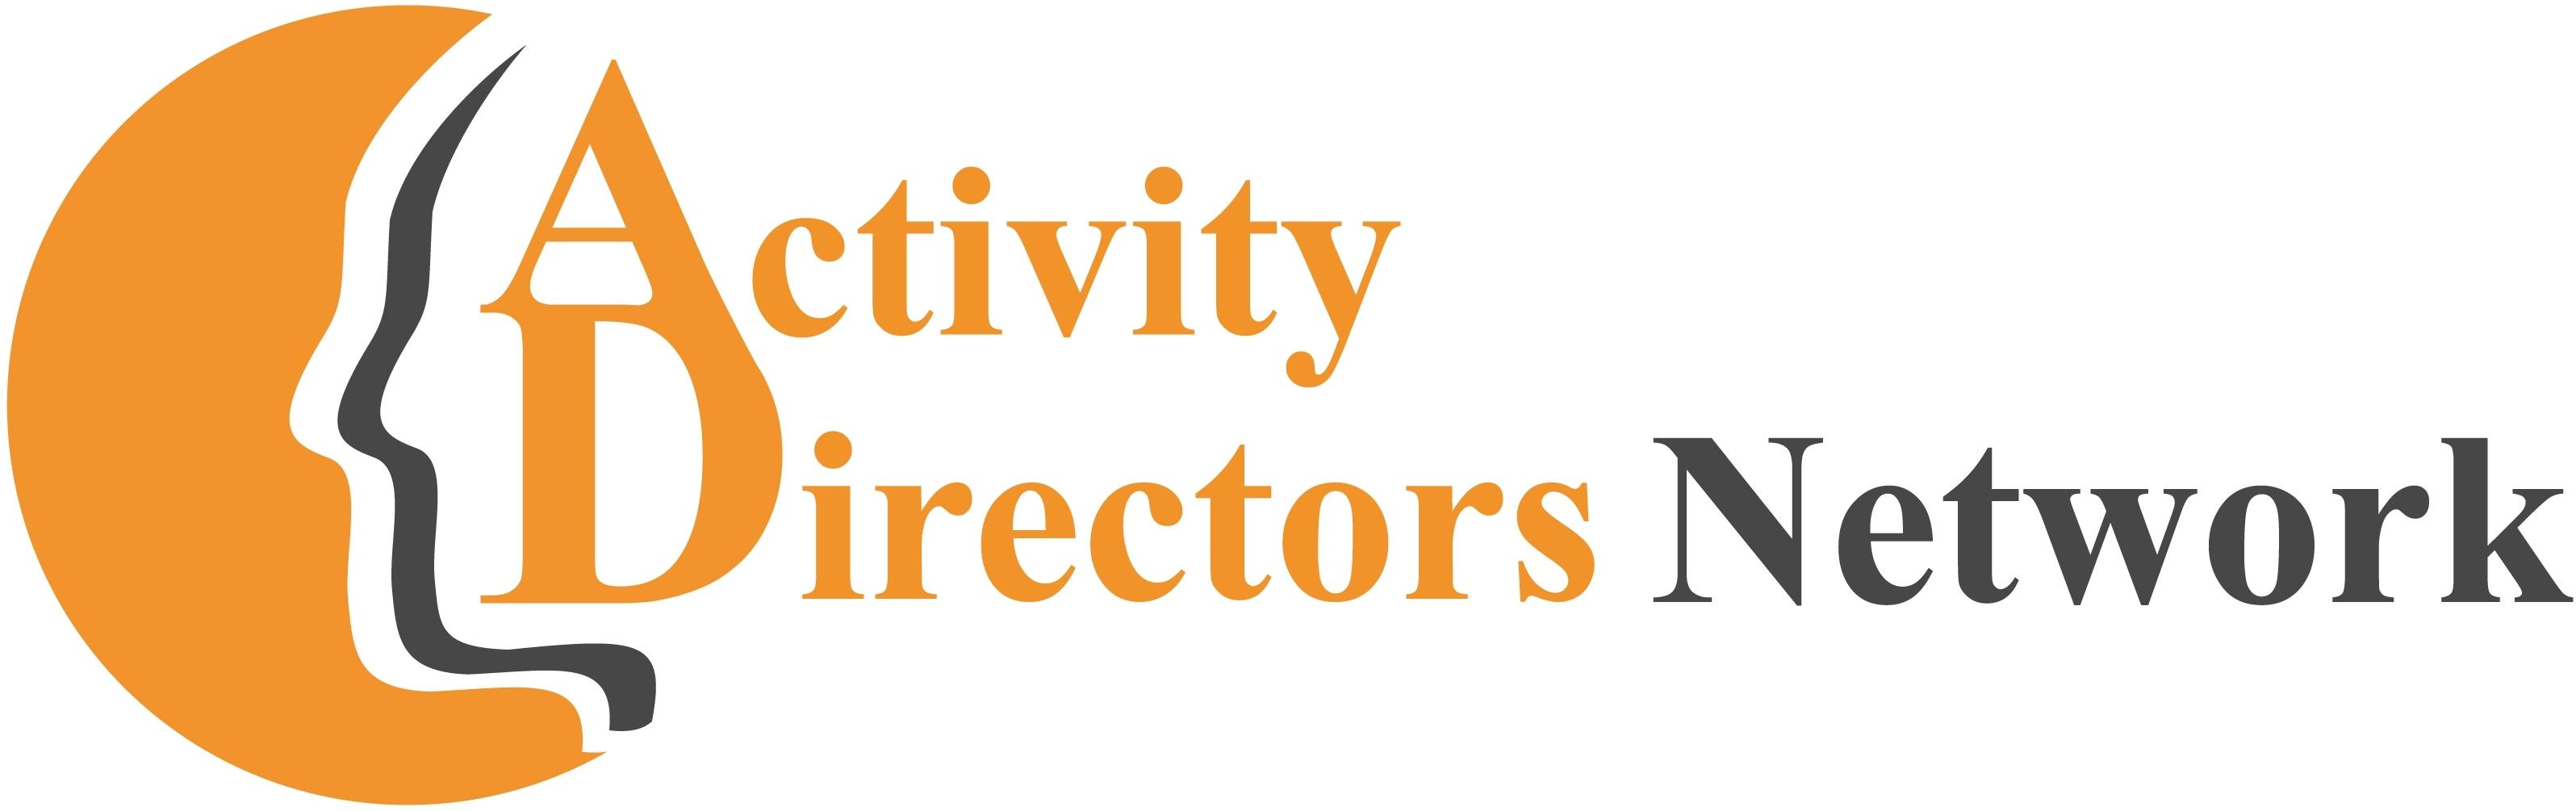 activity director redirect